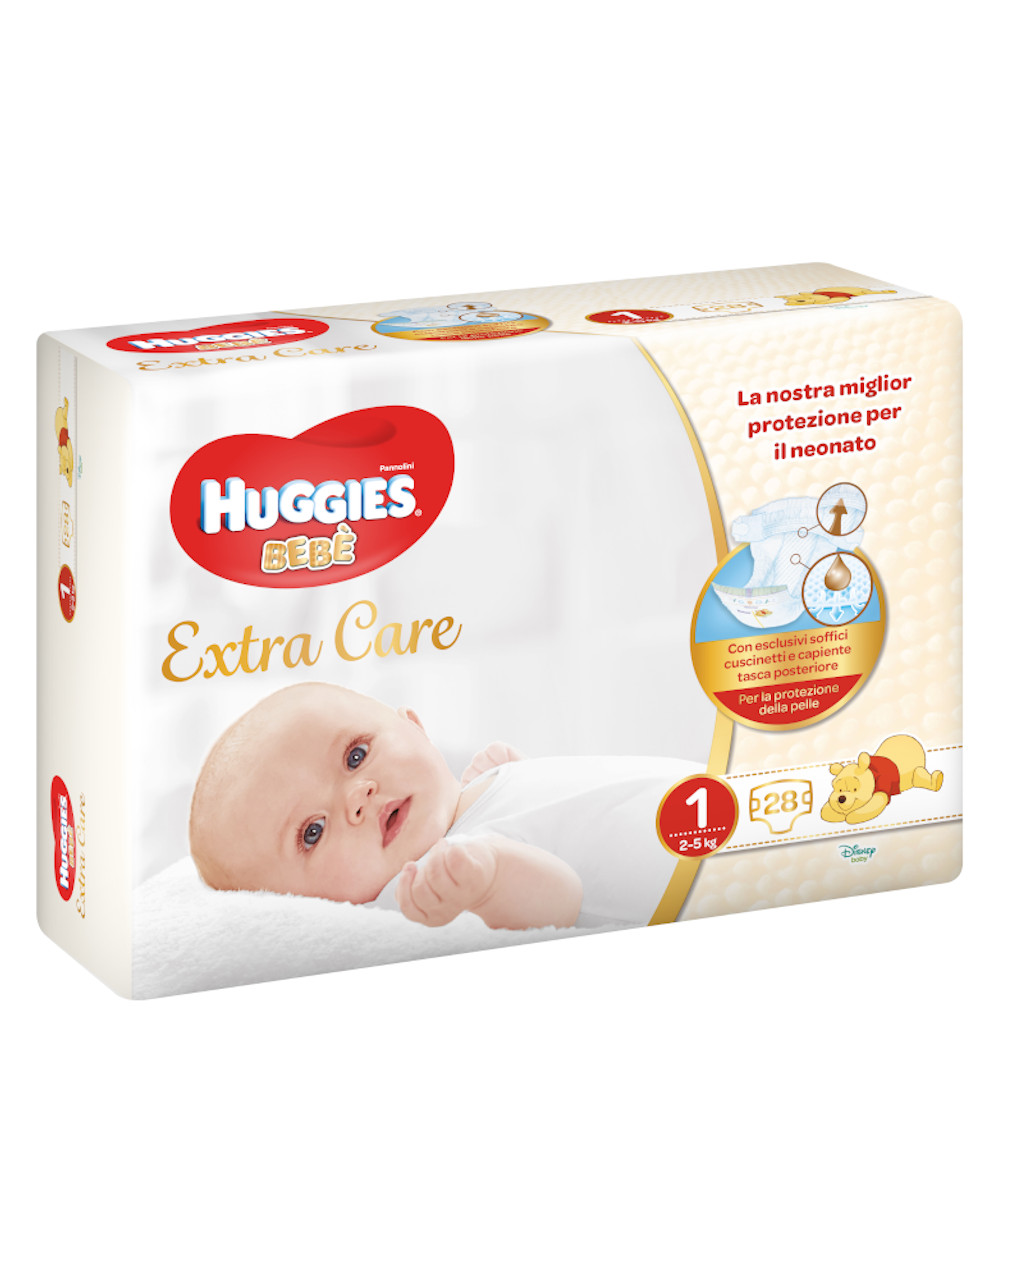 Huggies bebè extra care (2-5kg) - 28 pz - Huggies